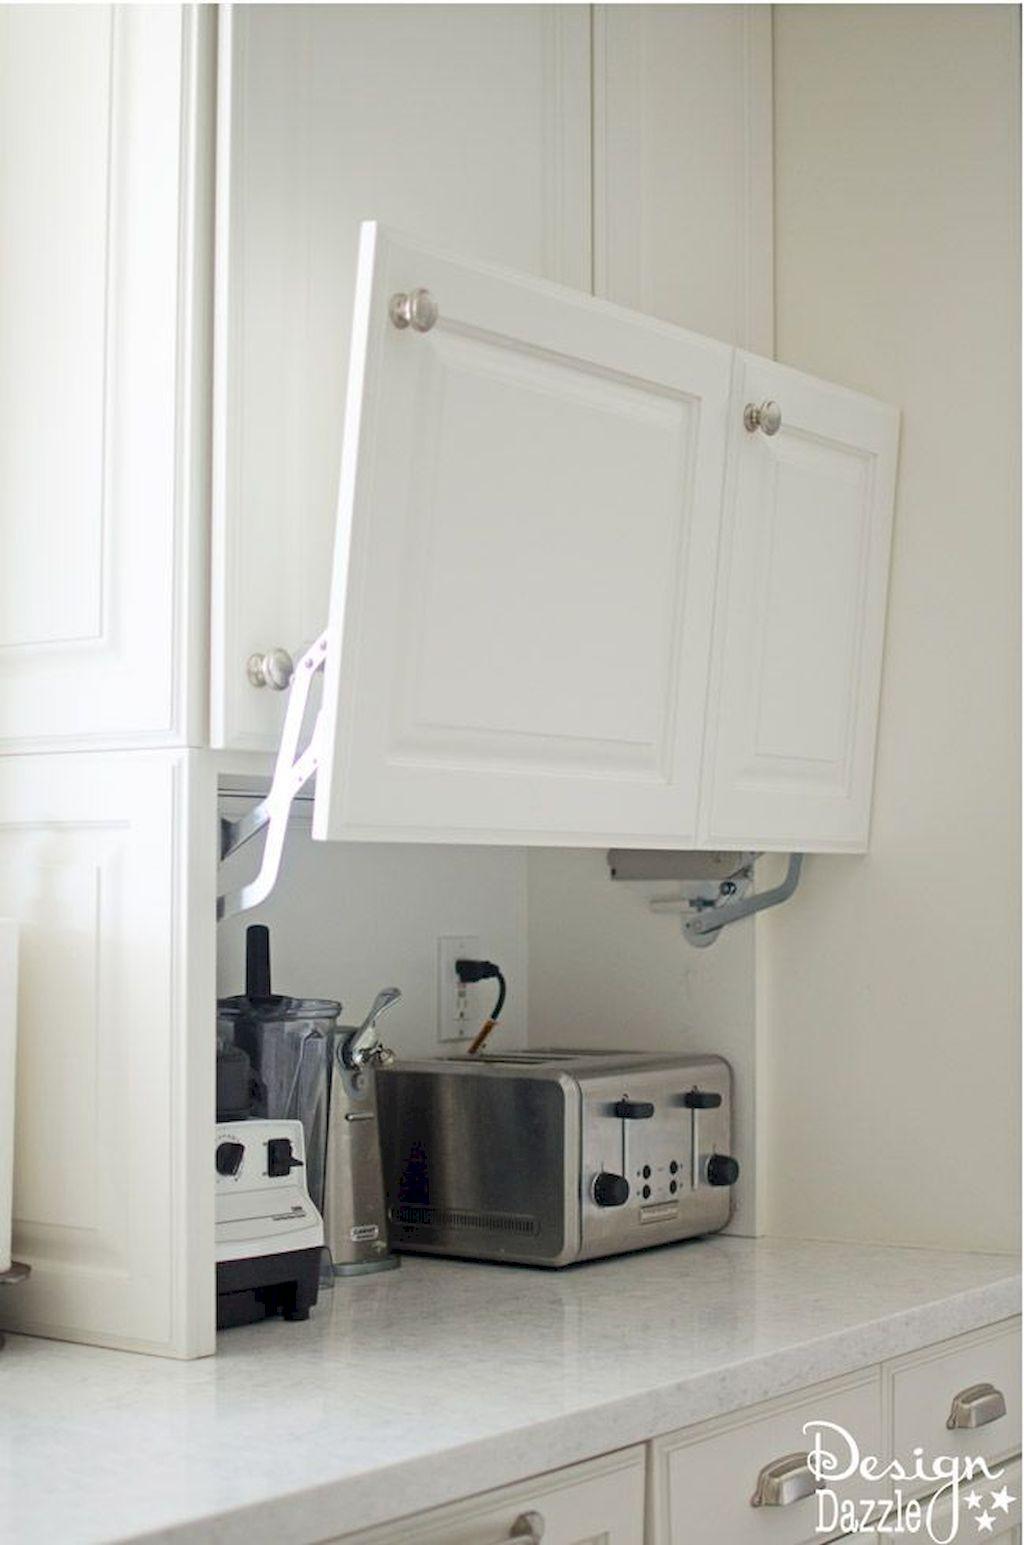 clean rustic kitchen decor ideas kitchens kitchen decor and house